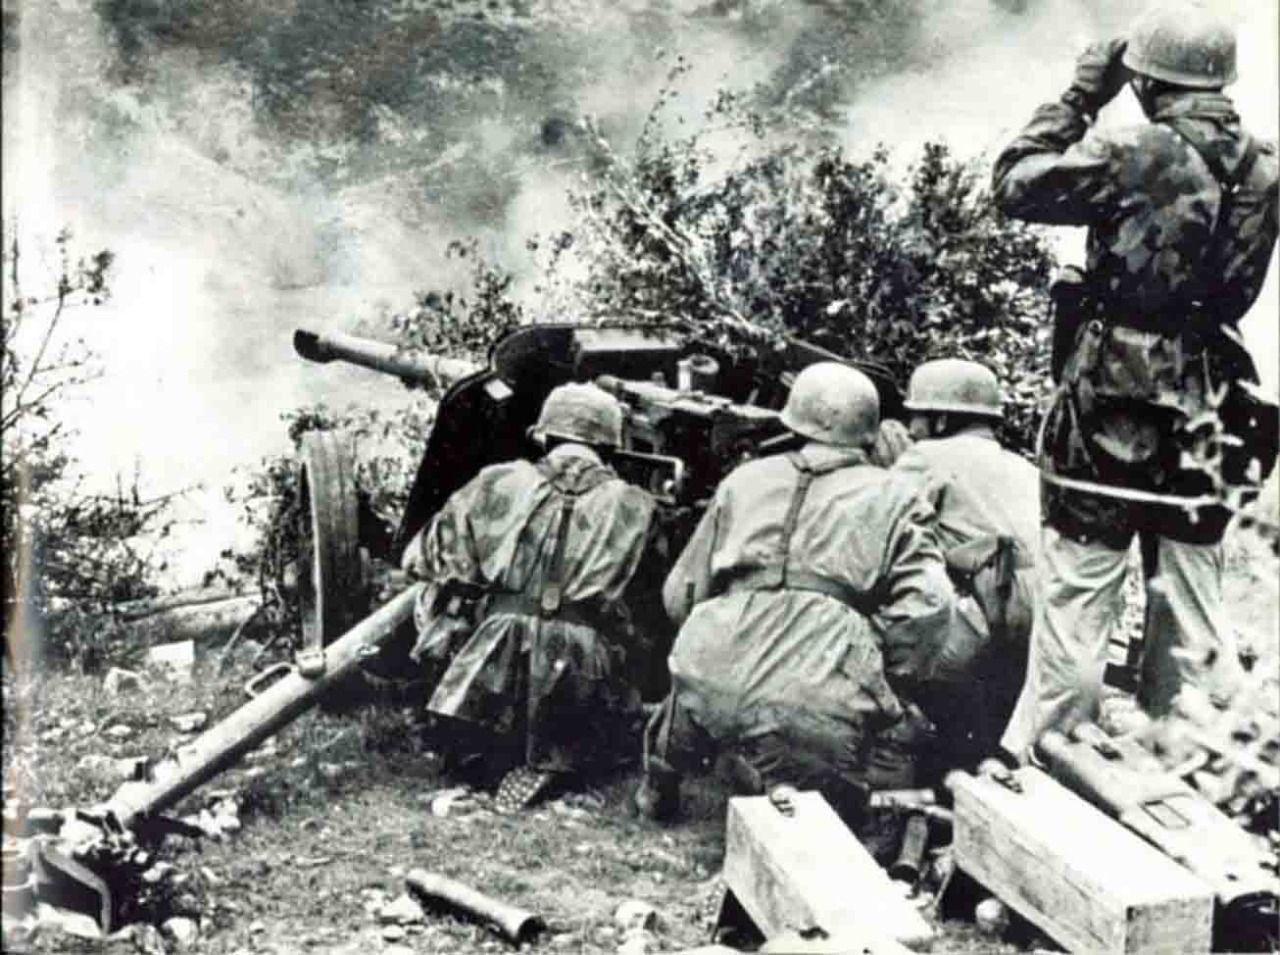 German 50 Mm Anti Tank Gun: A Team Of German 50mm PaK 38 Anti-tank Gun In Combat In